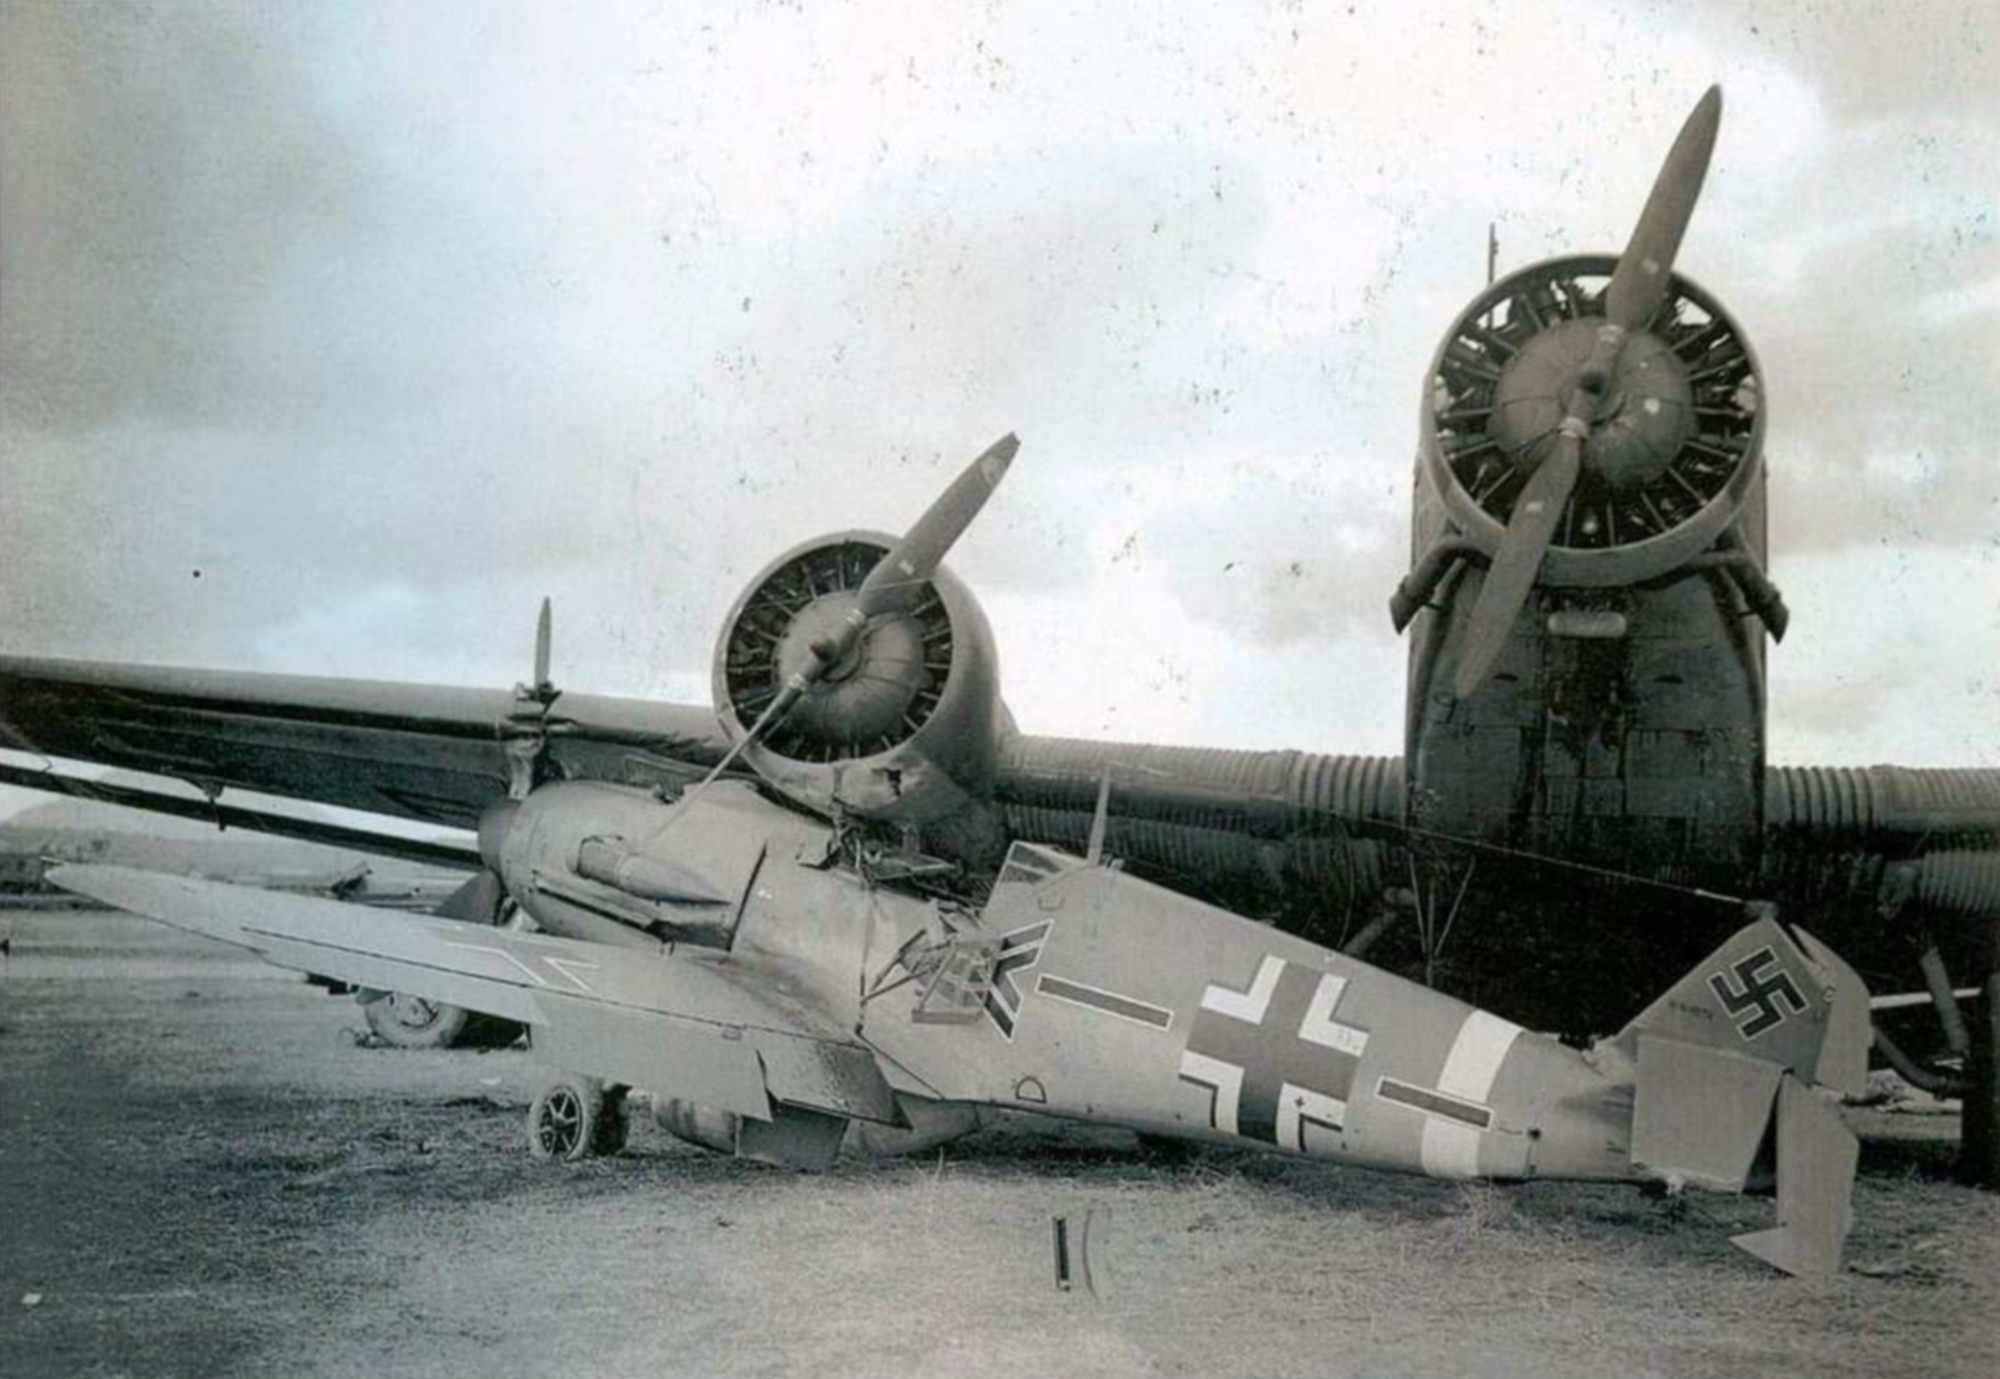 Messerschmitt Bf 109F4Trop Stab II.JG27 WNr 8578 in ground accident with Ju 52.3m Revi 57 2009